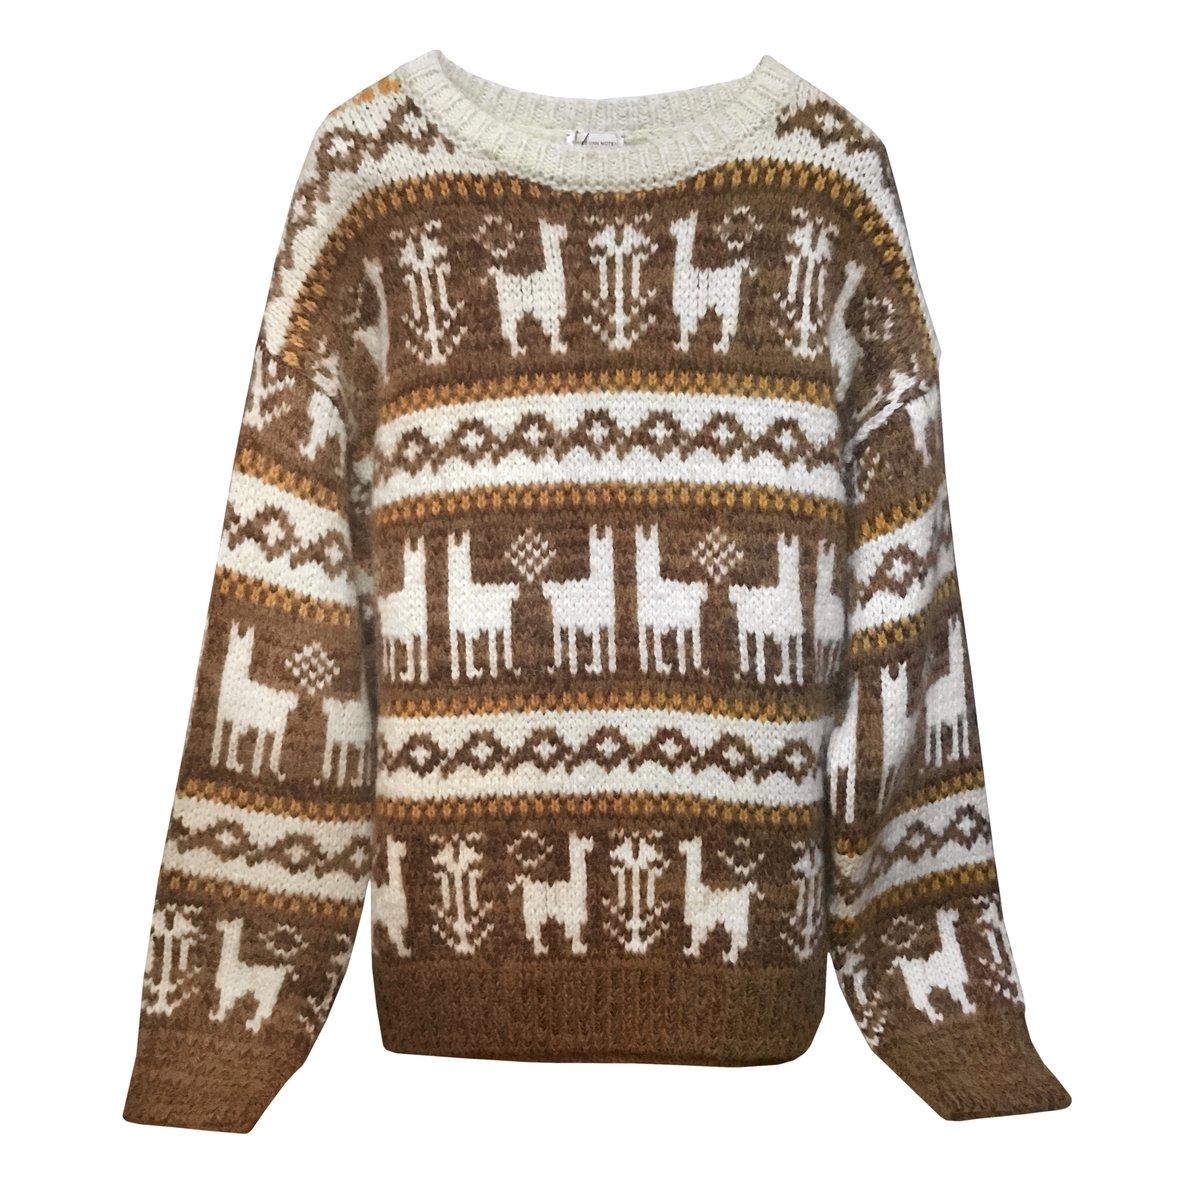 Dries Van Noten Oversized Fair Isle Alpaca Wool Sweater.jpg